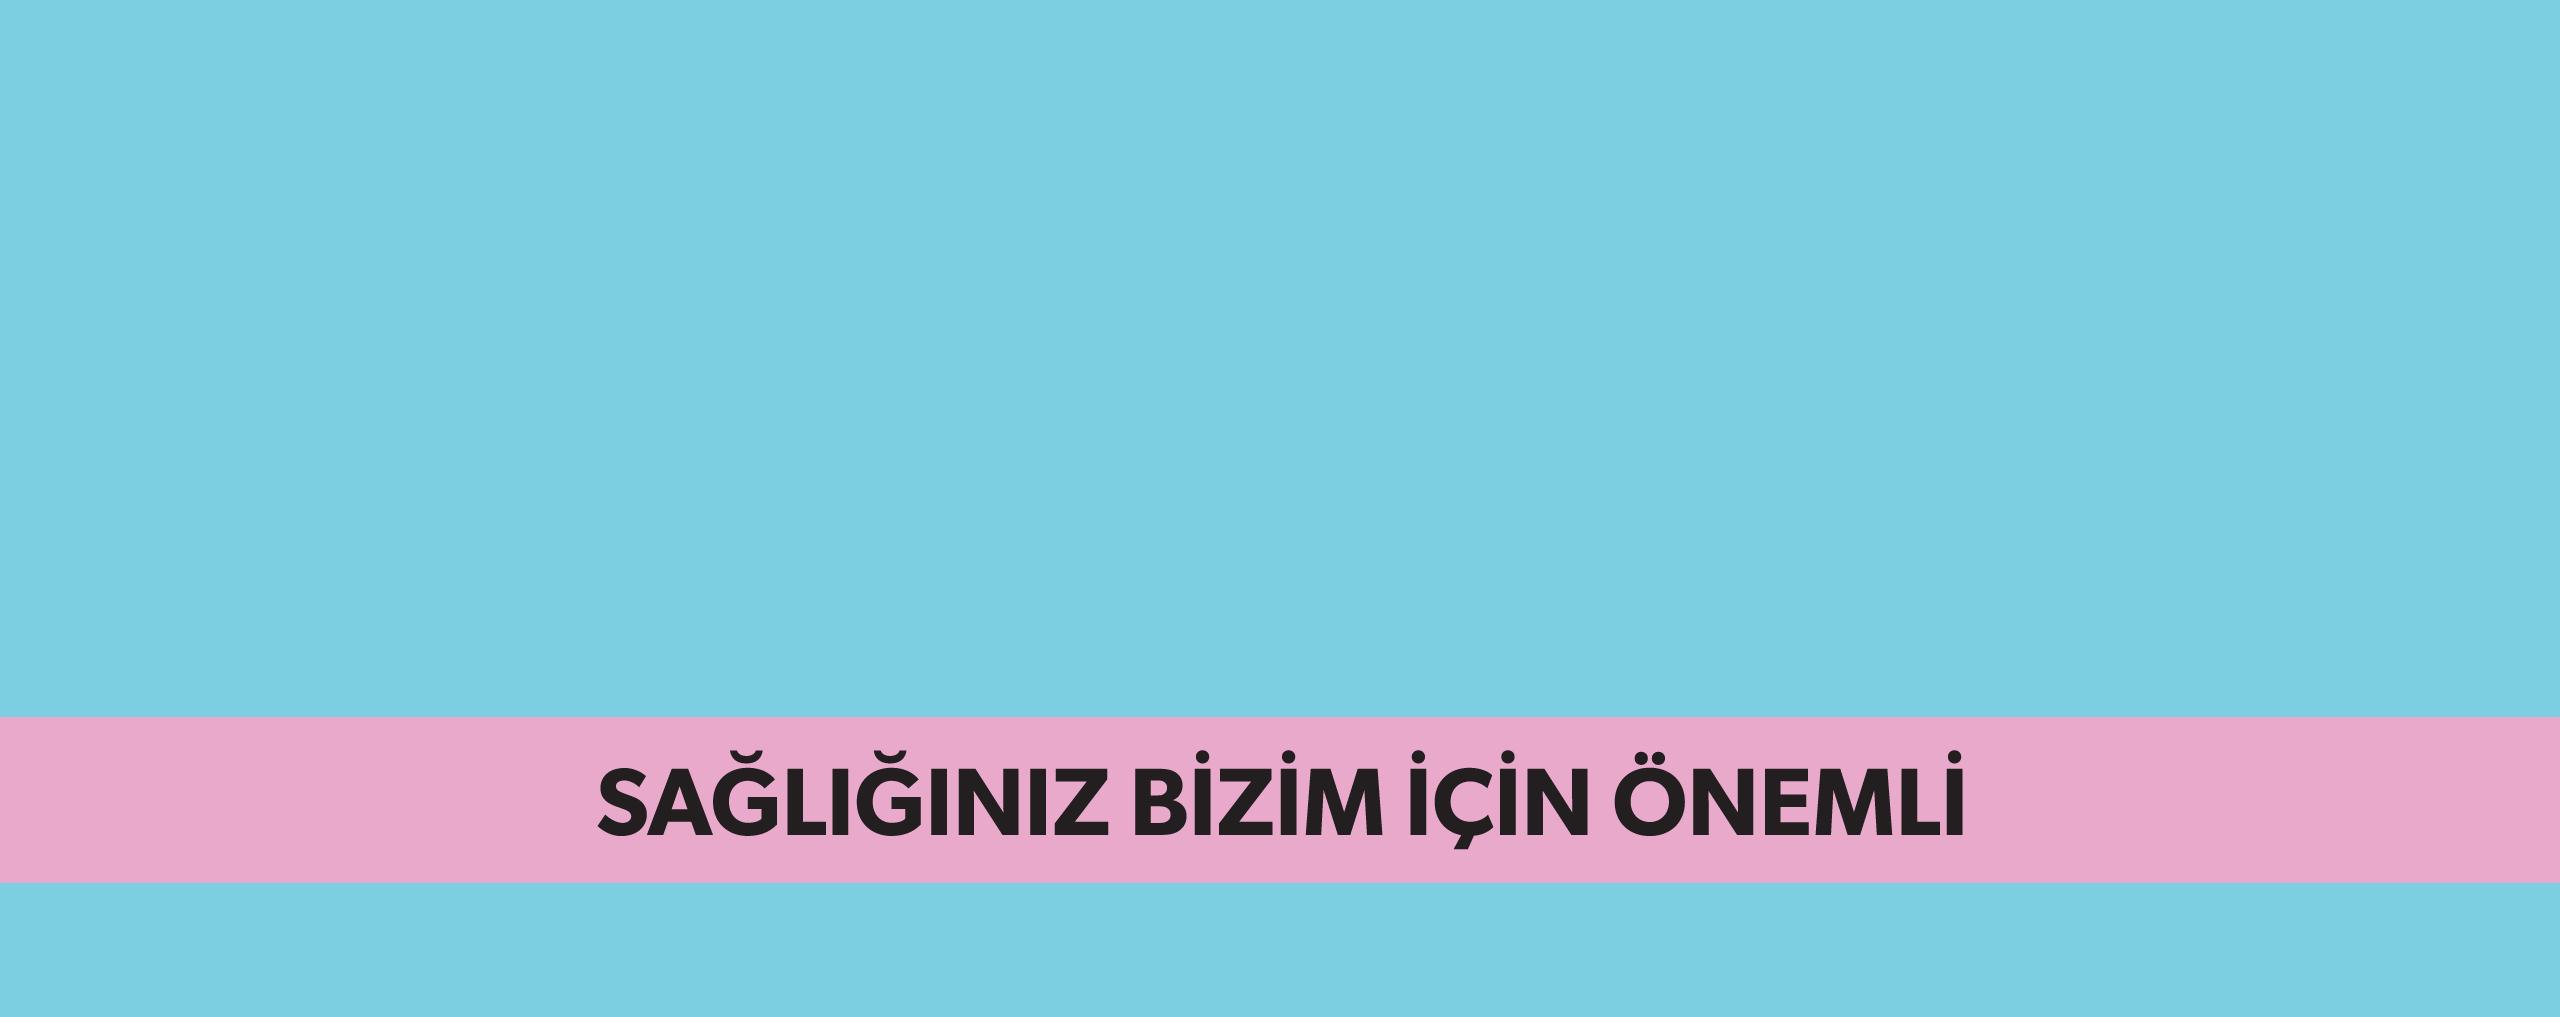 web_banner-01